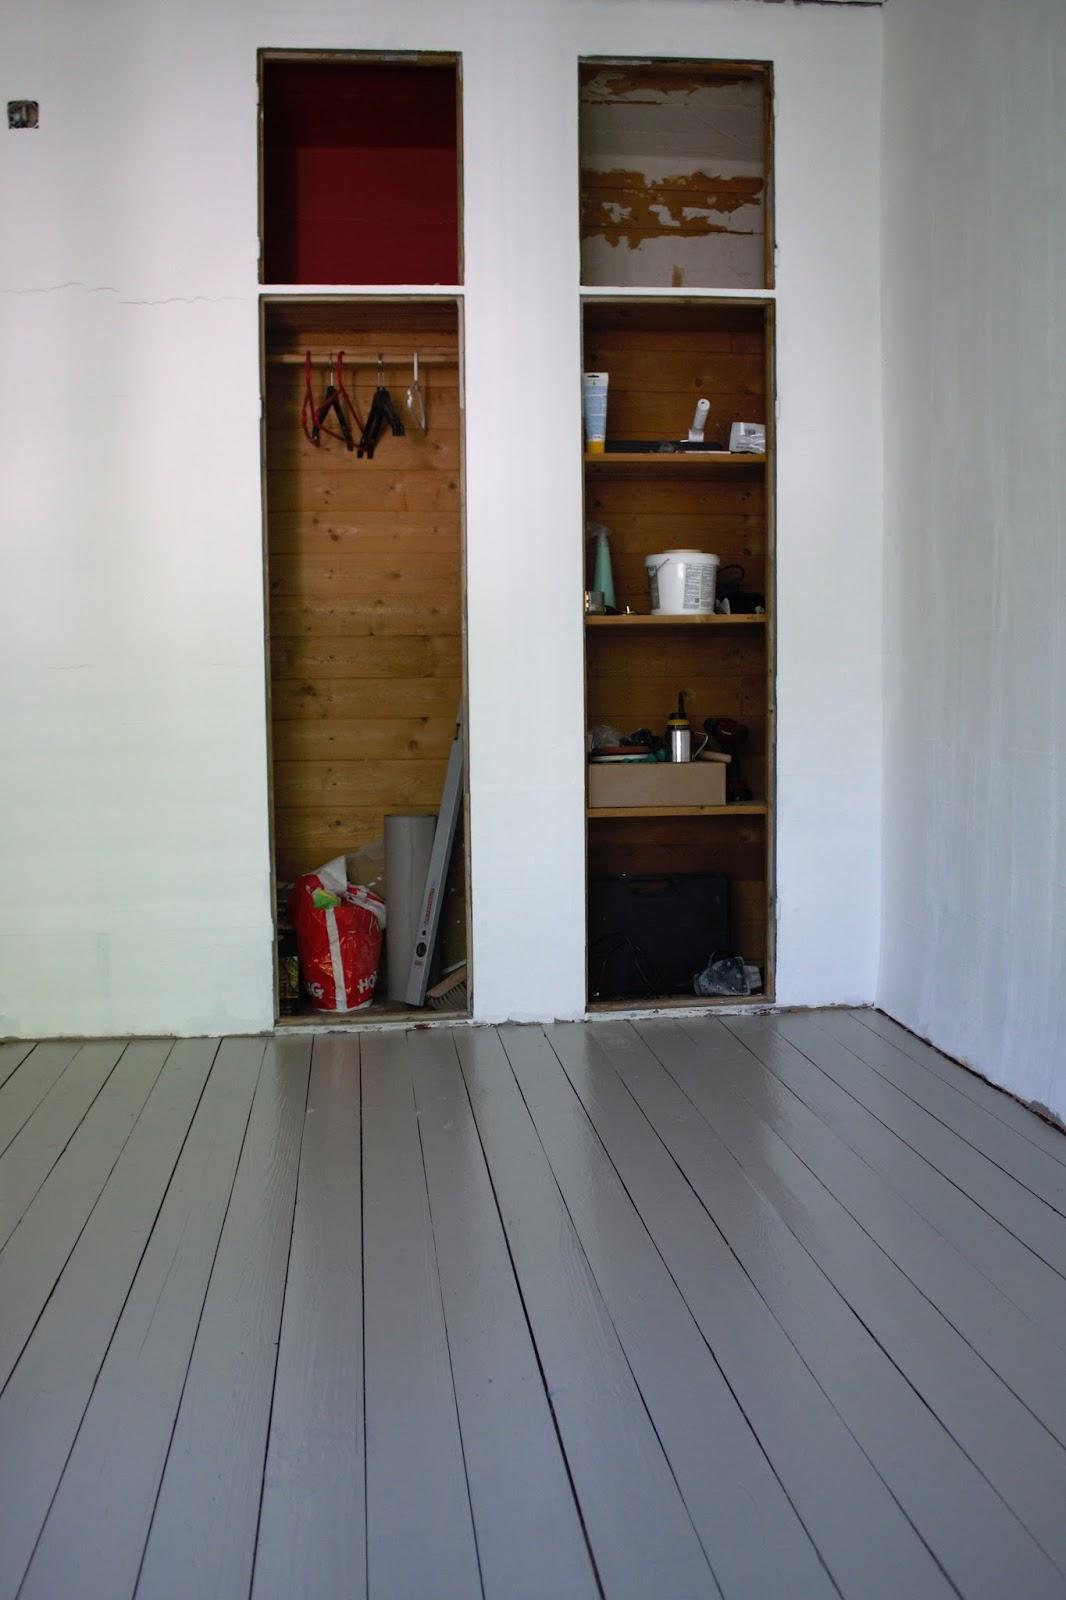 lautalattiat, lumppupaperi, maalattu lattia, pönttöuuni, rintamamiestalo, remontti